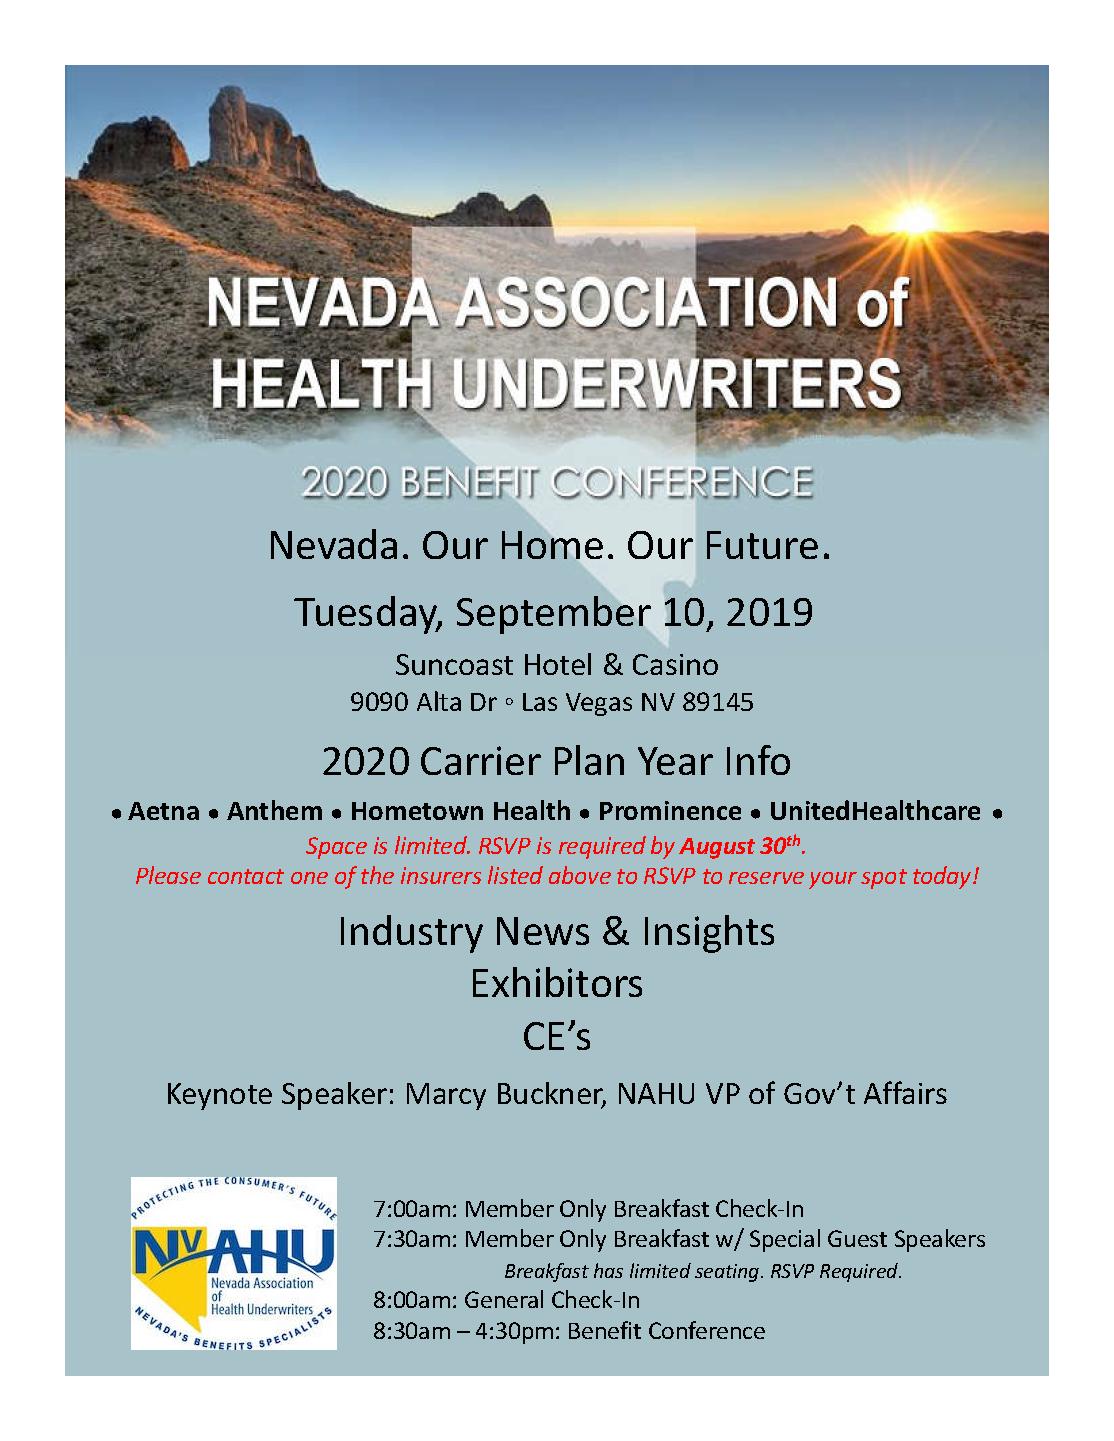 NVAHU 2019 Benefit Conference Flyer - Producer.png